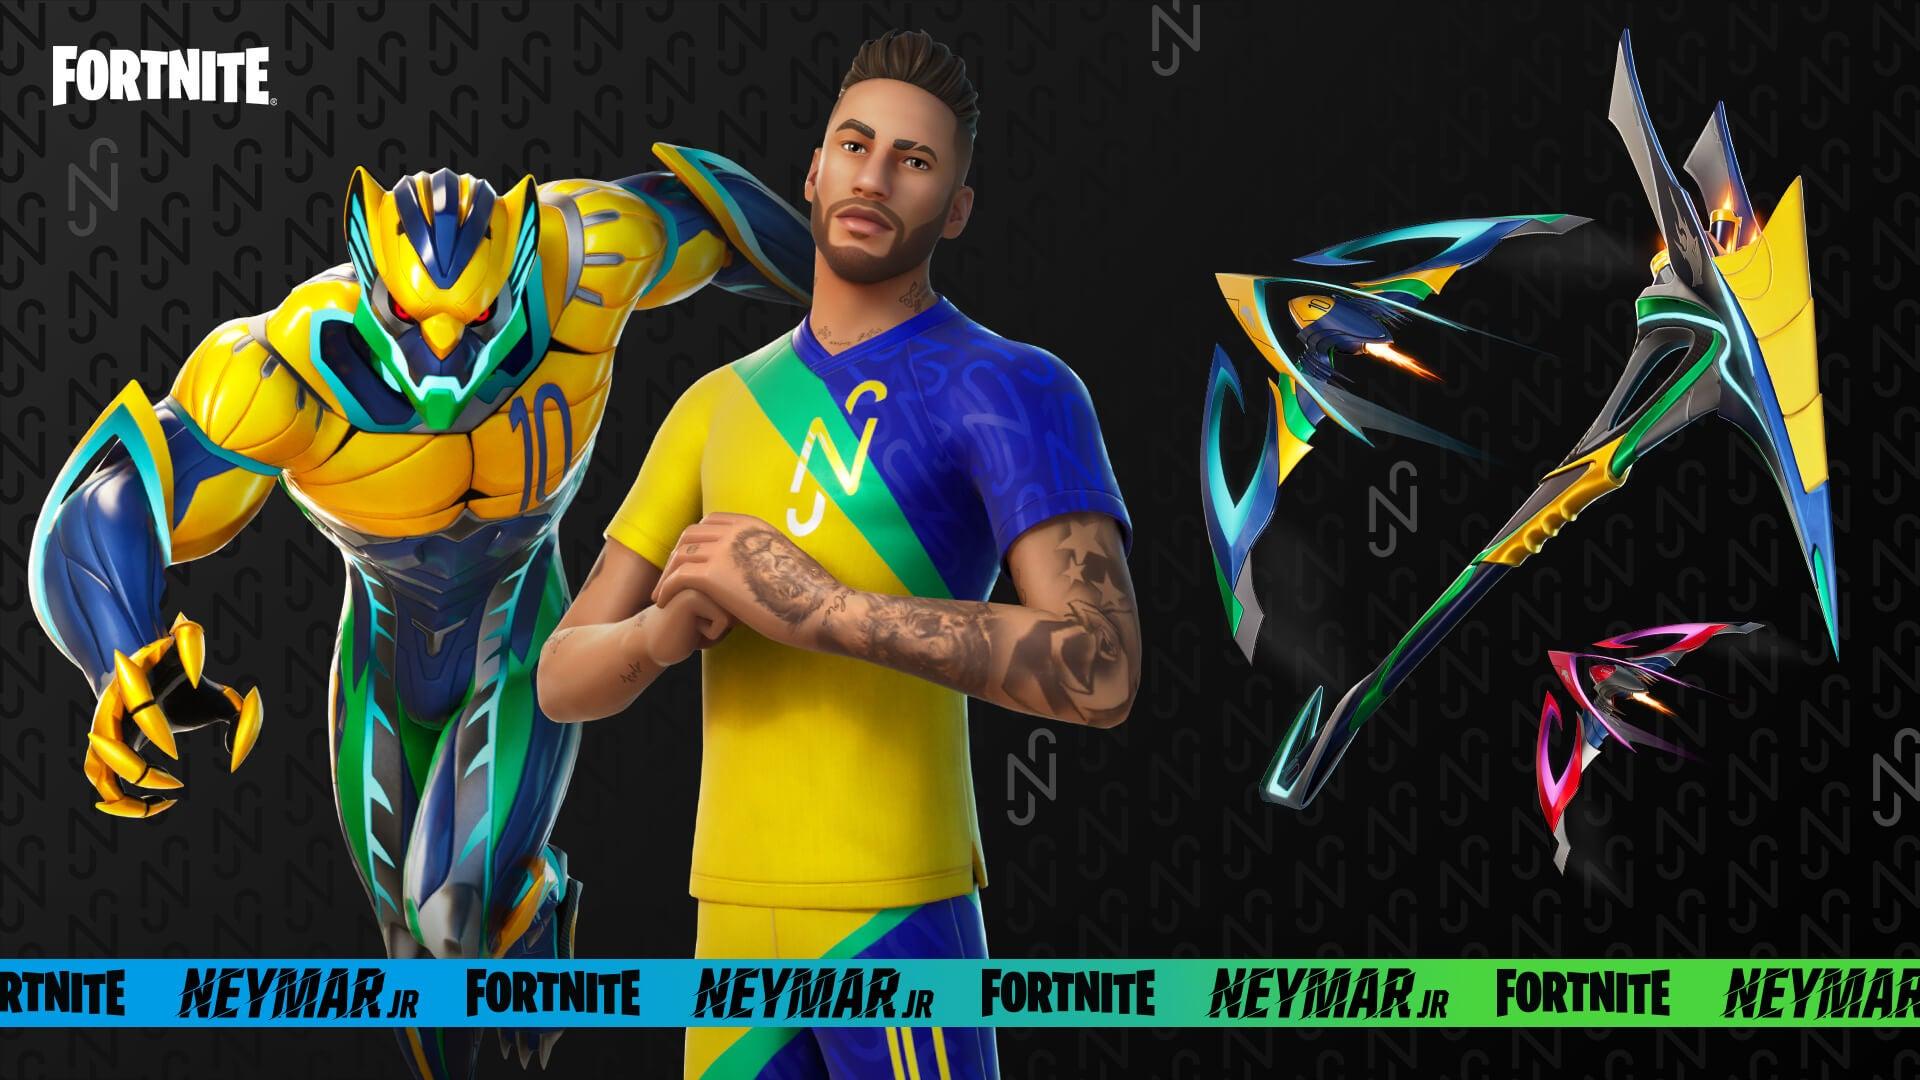 Image for Neymar Jr arrives in Fortnite later this week